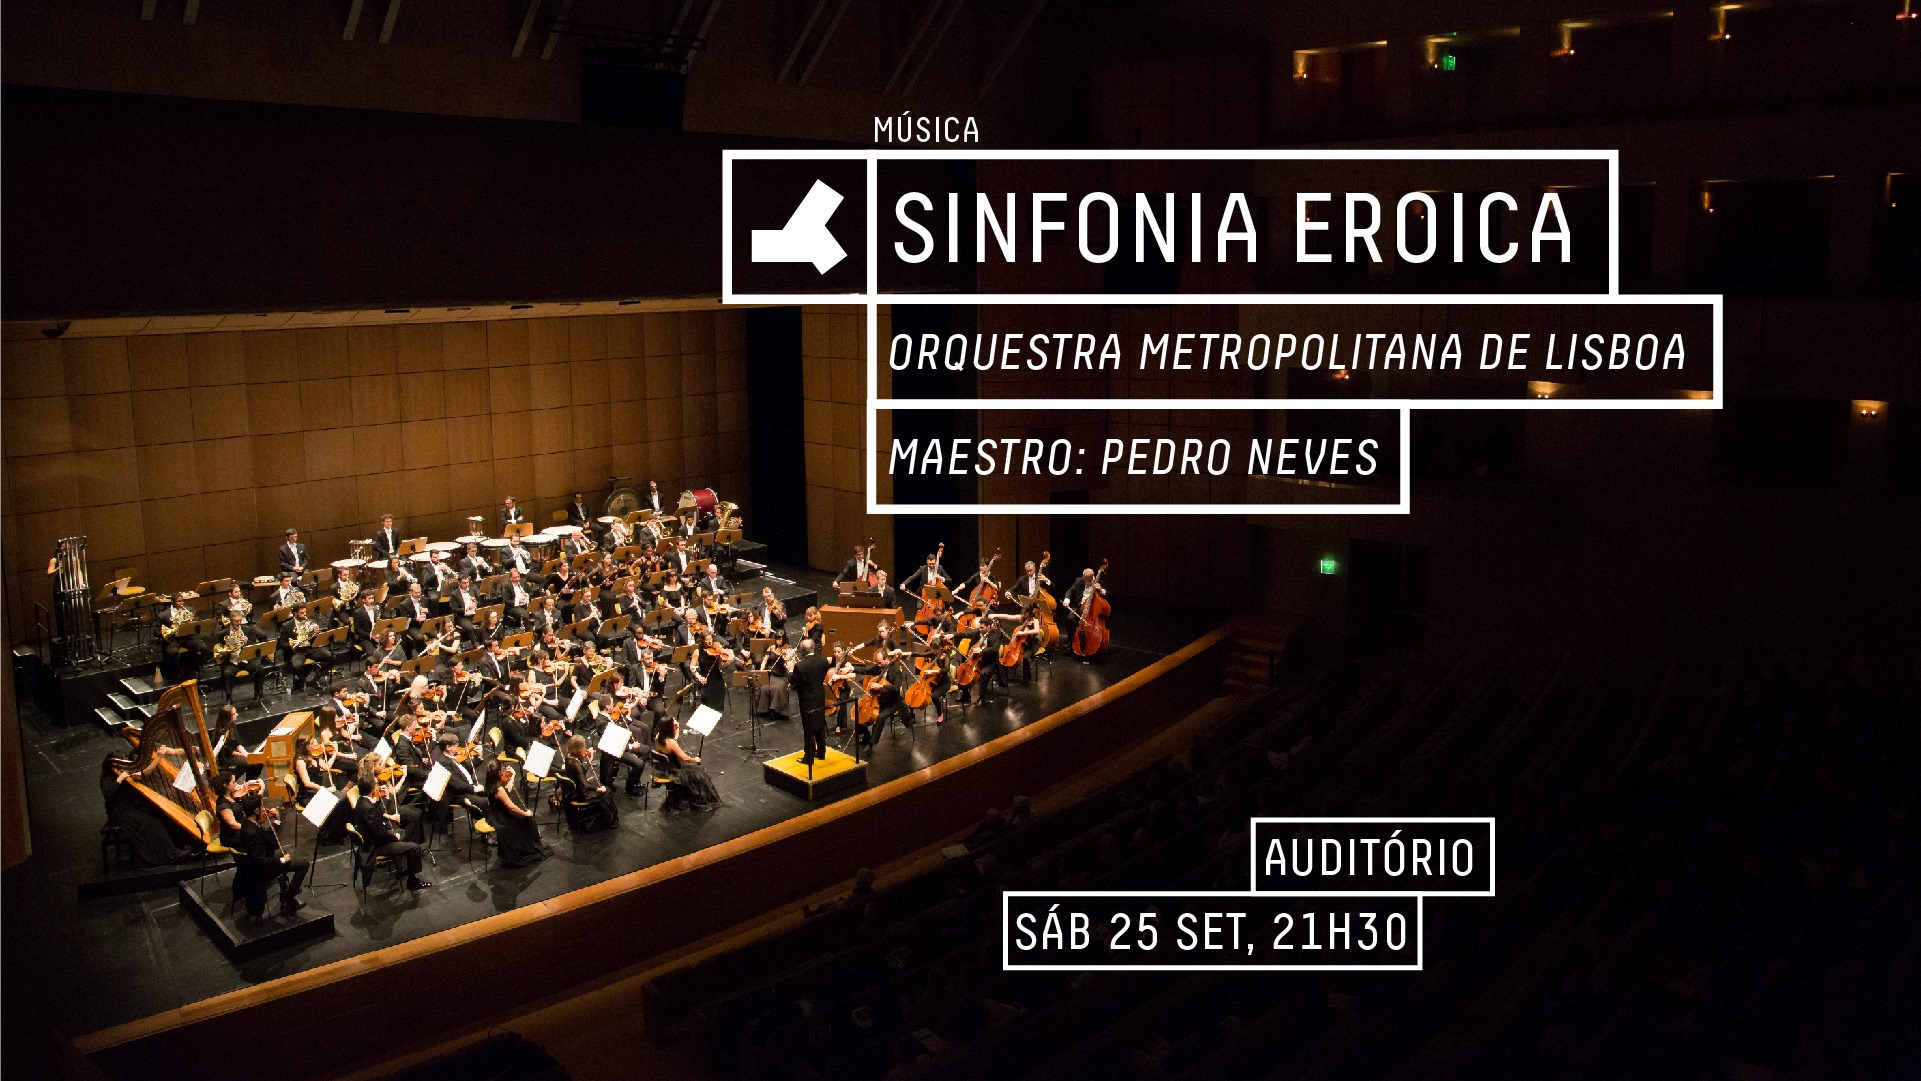 Sinfonia Eroica   Orquestra Metropolitana de Lisboa